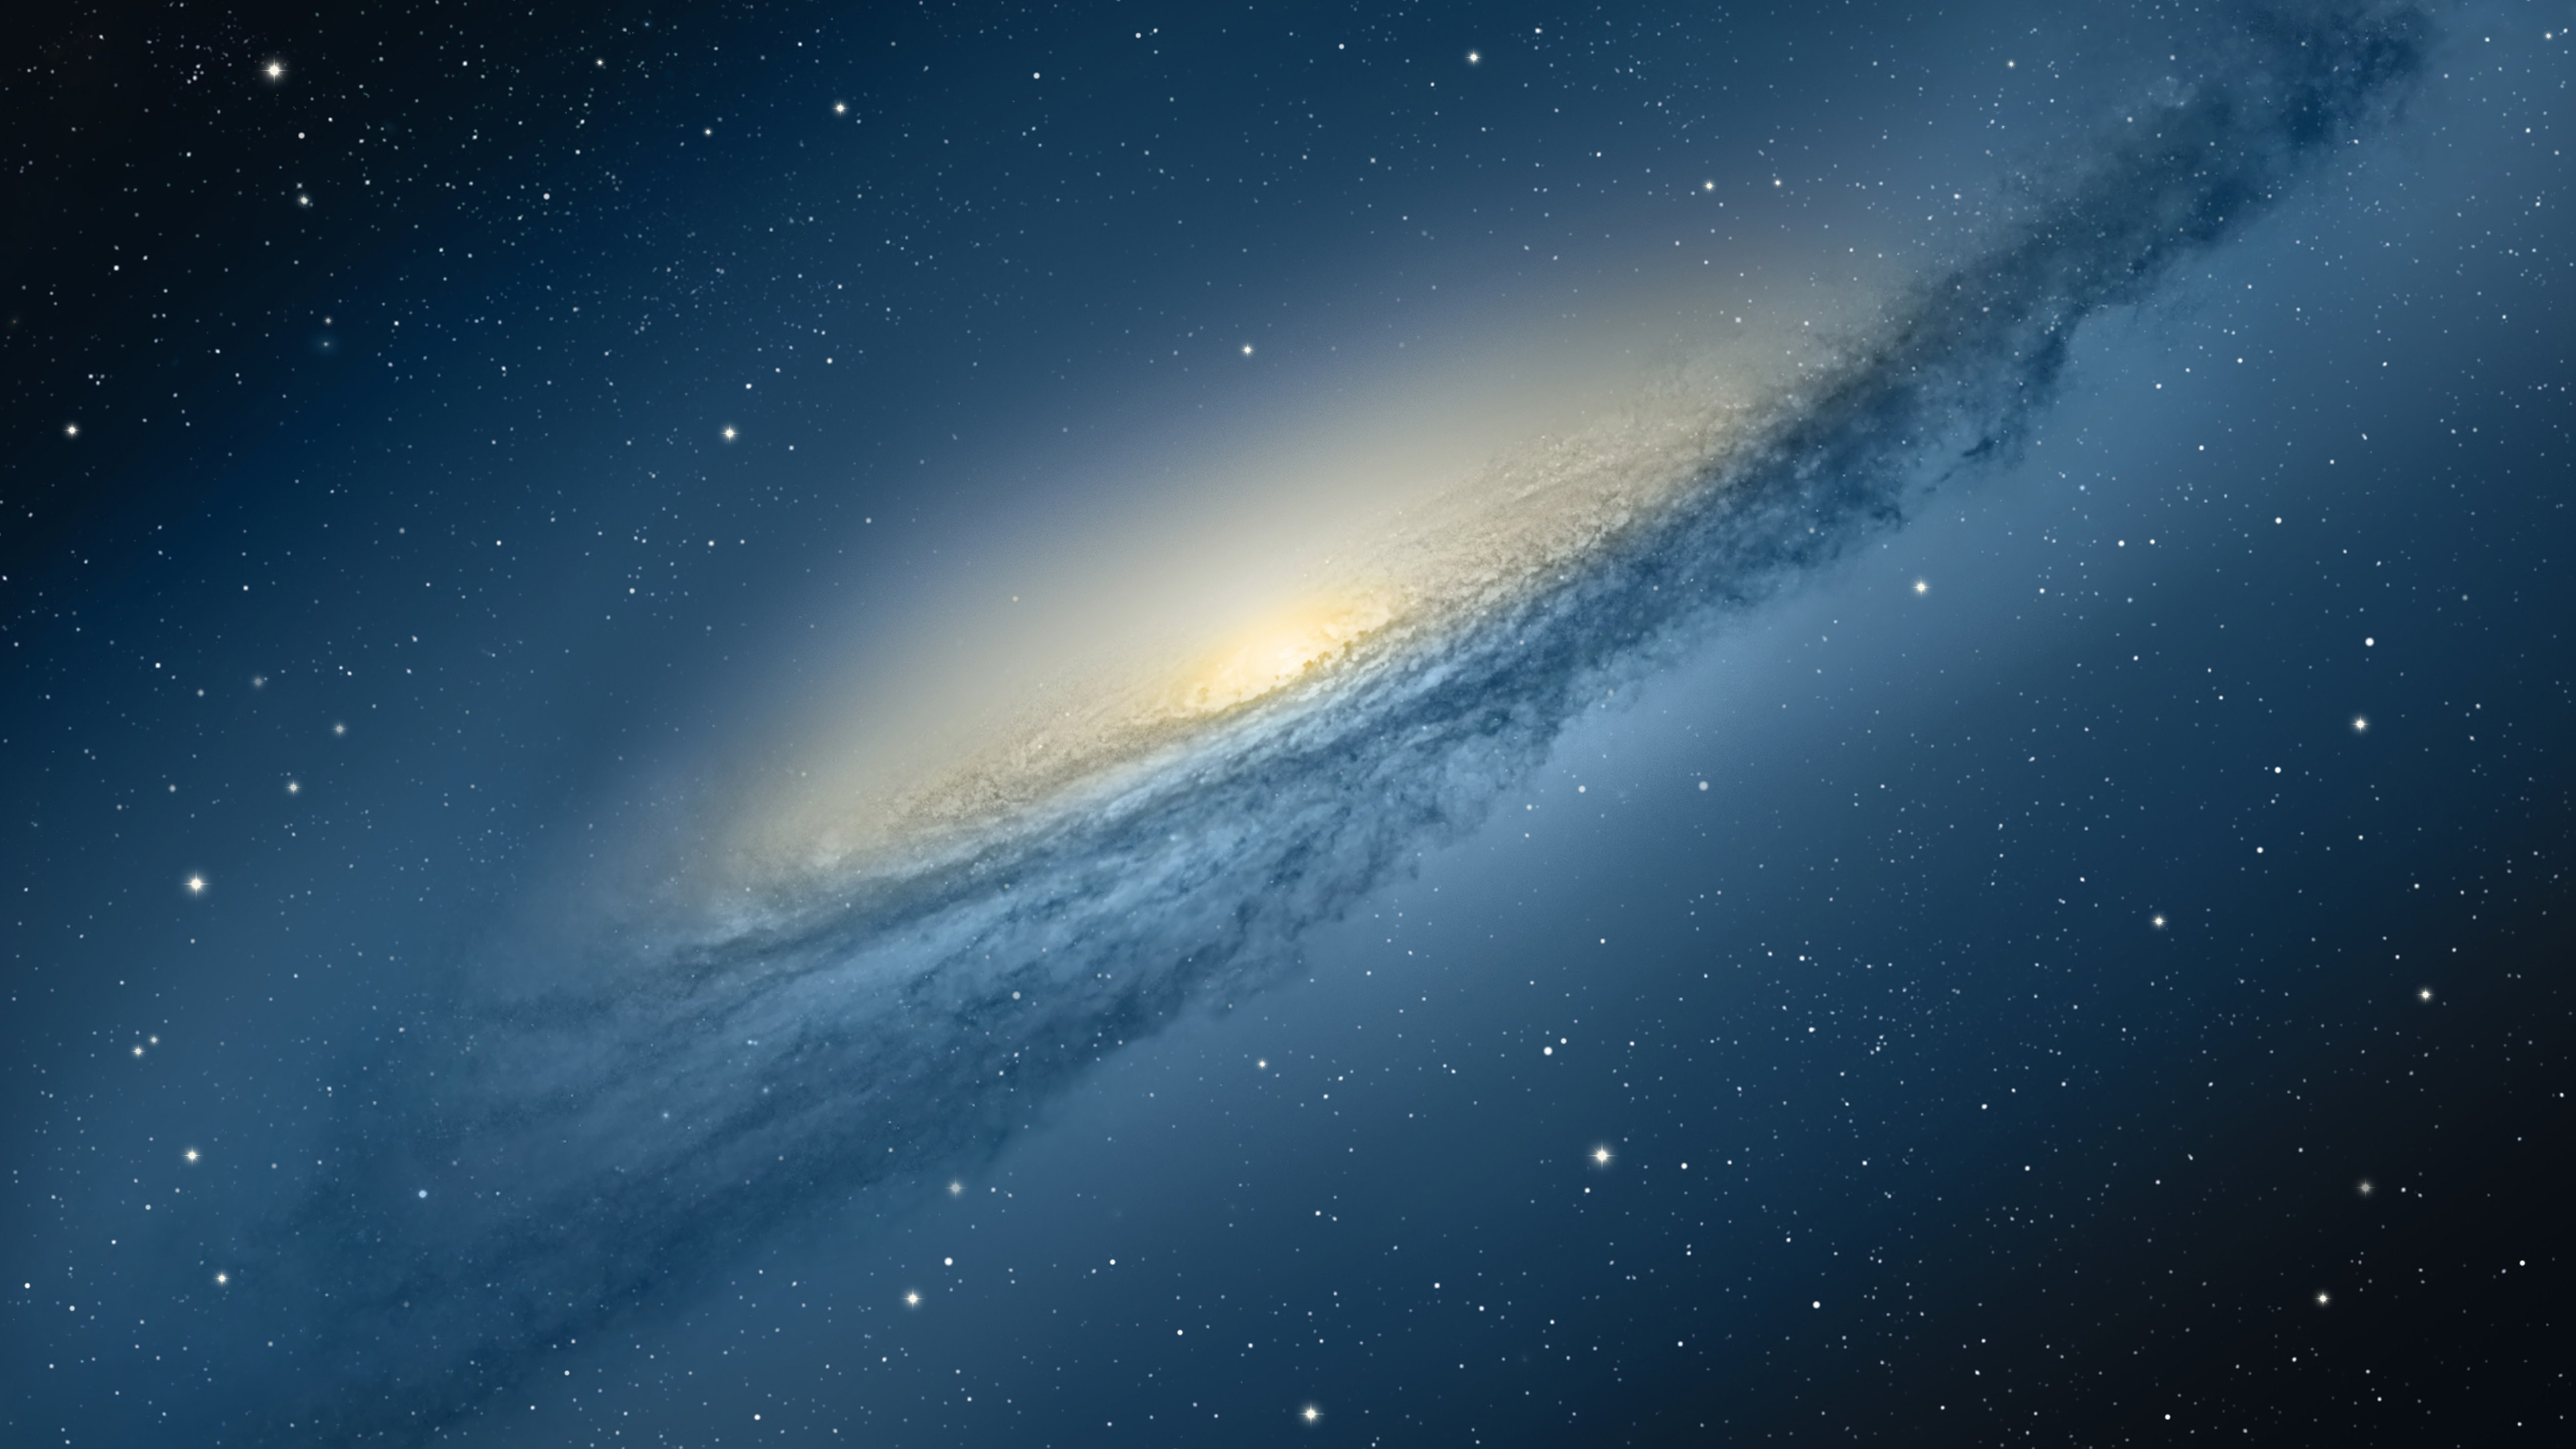 Scientific space planet galaxy stars mac ox ultrahd 4k wallpaper wallpaper      196208   WallpaperUP